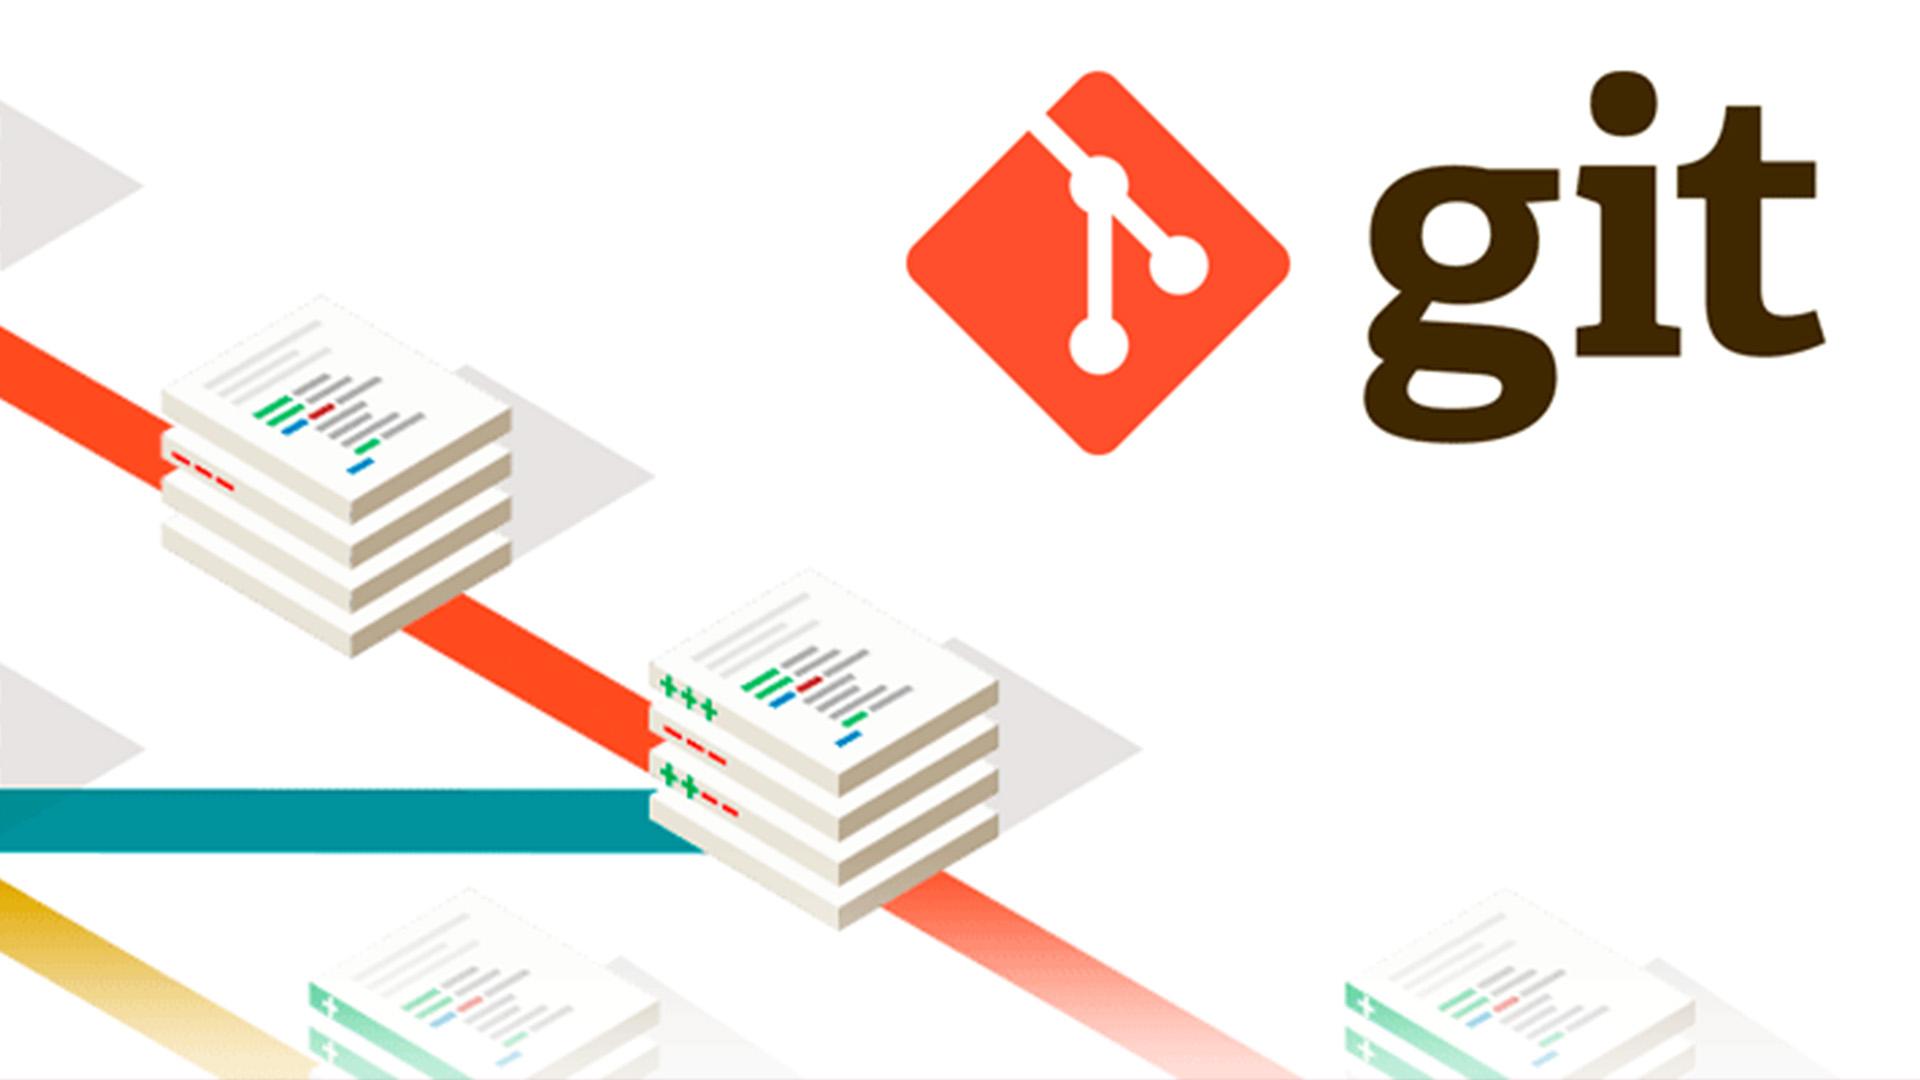 Aprendendo Git